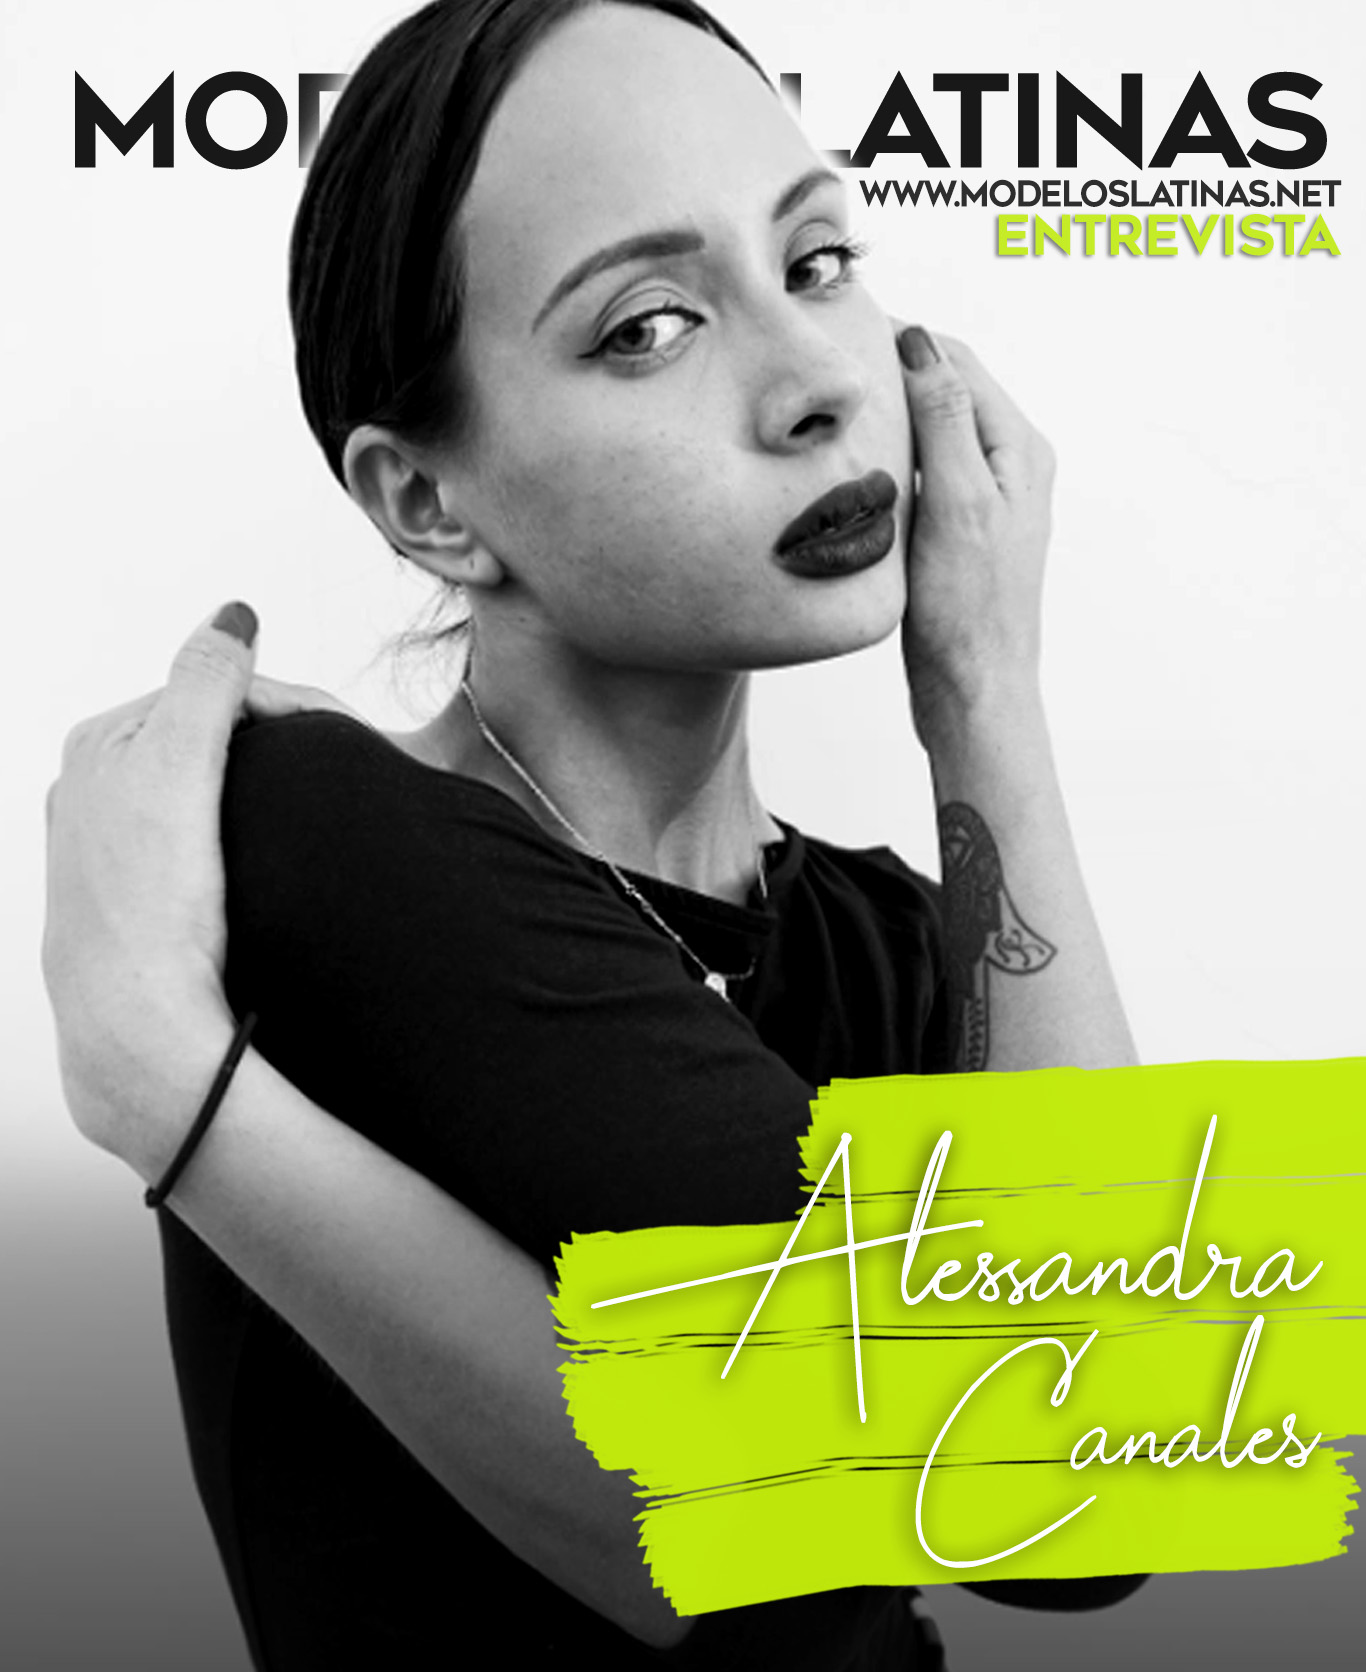 Alessandra Canales